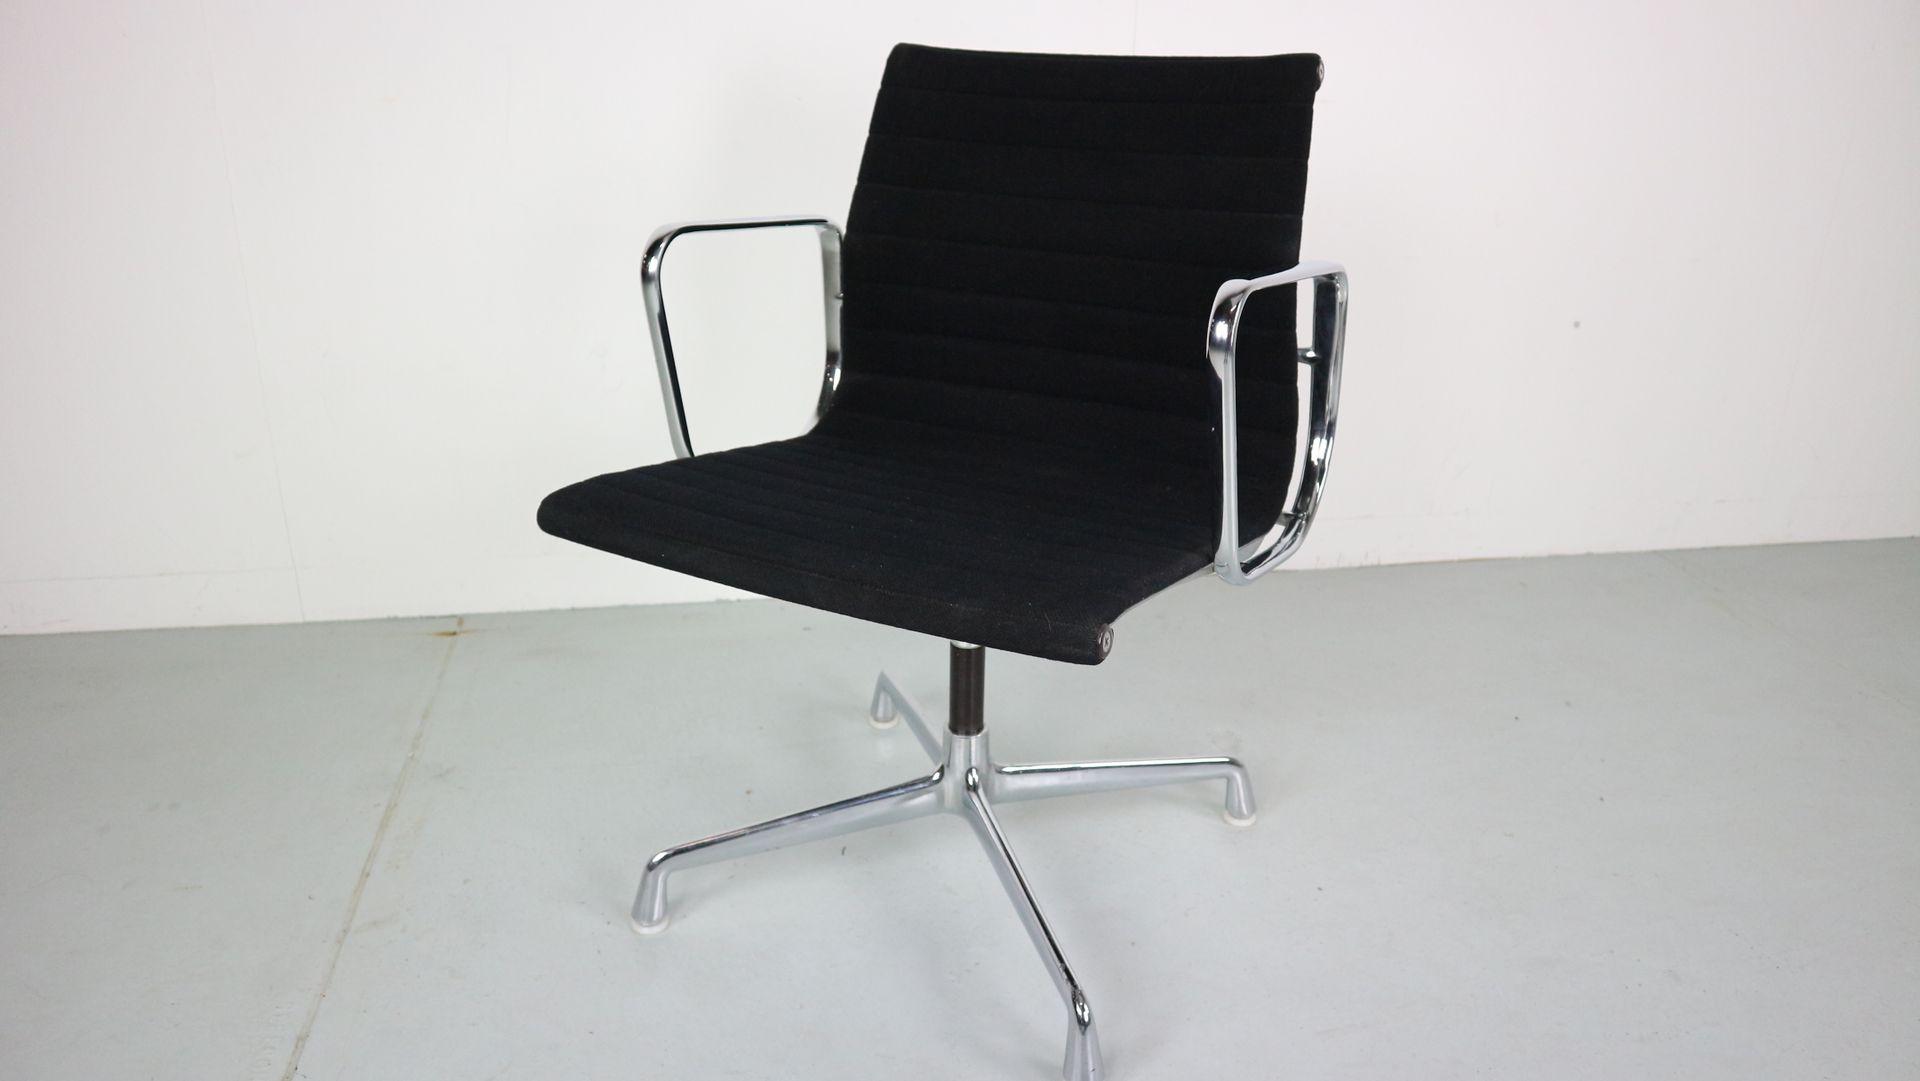 ea108 stuhl aus aluminium von charles ray eames f r vitra 1970er bei pamono kaufen. Black Bedroom Furniture Sets. Home Design Ideas